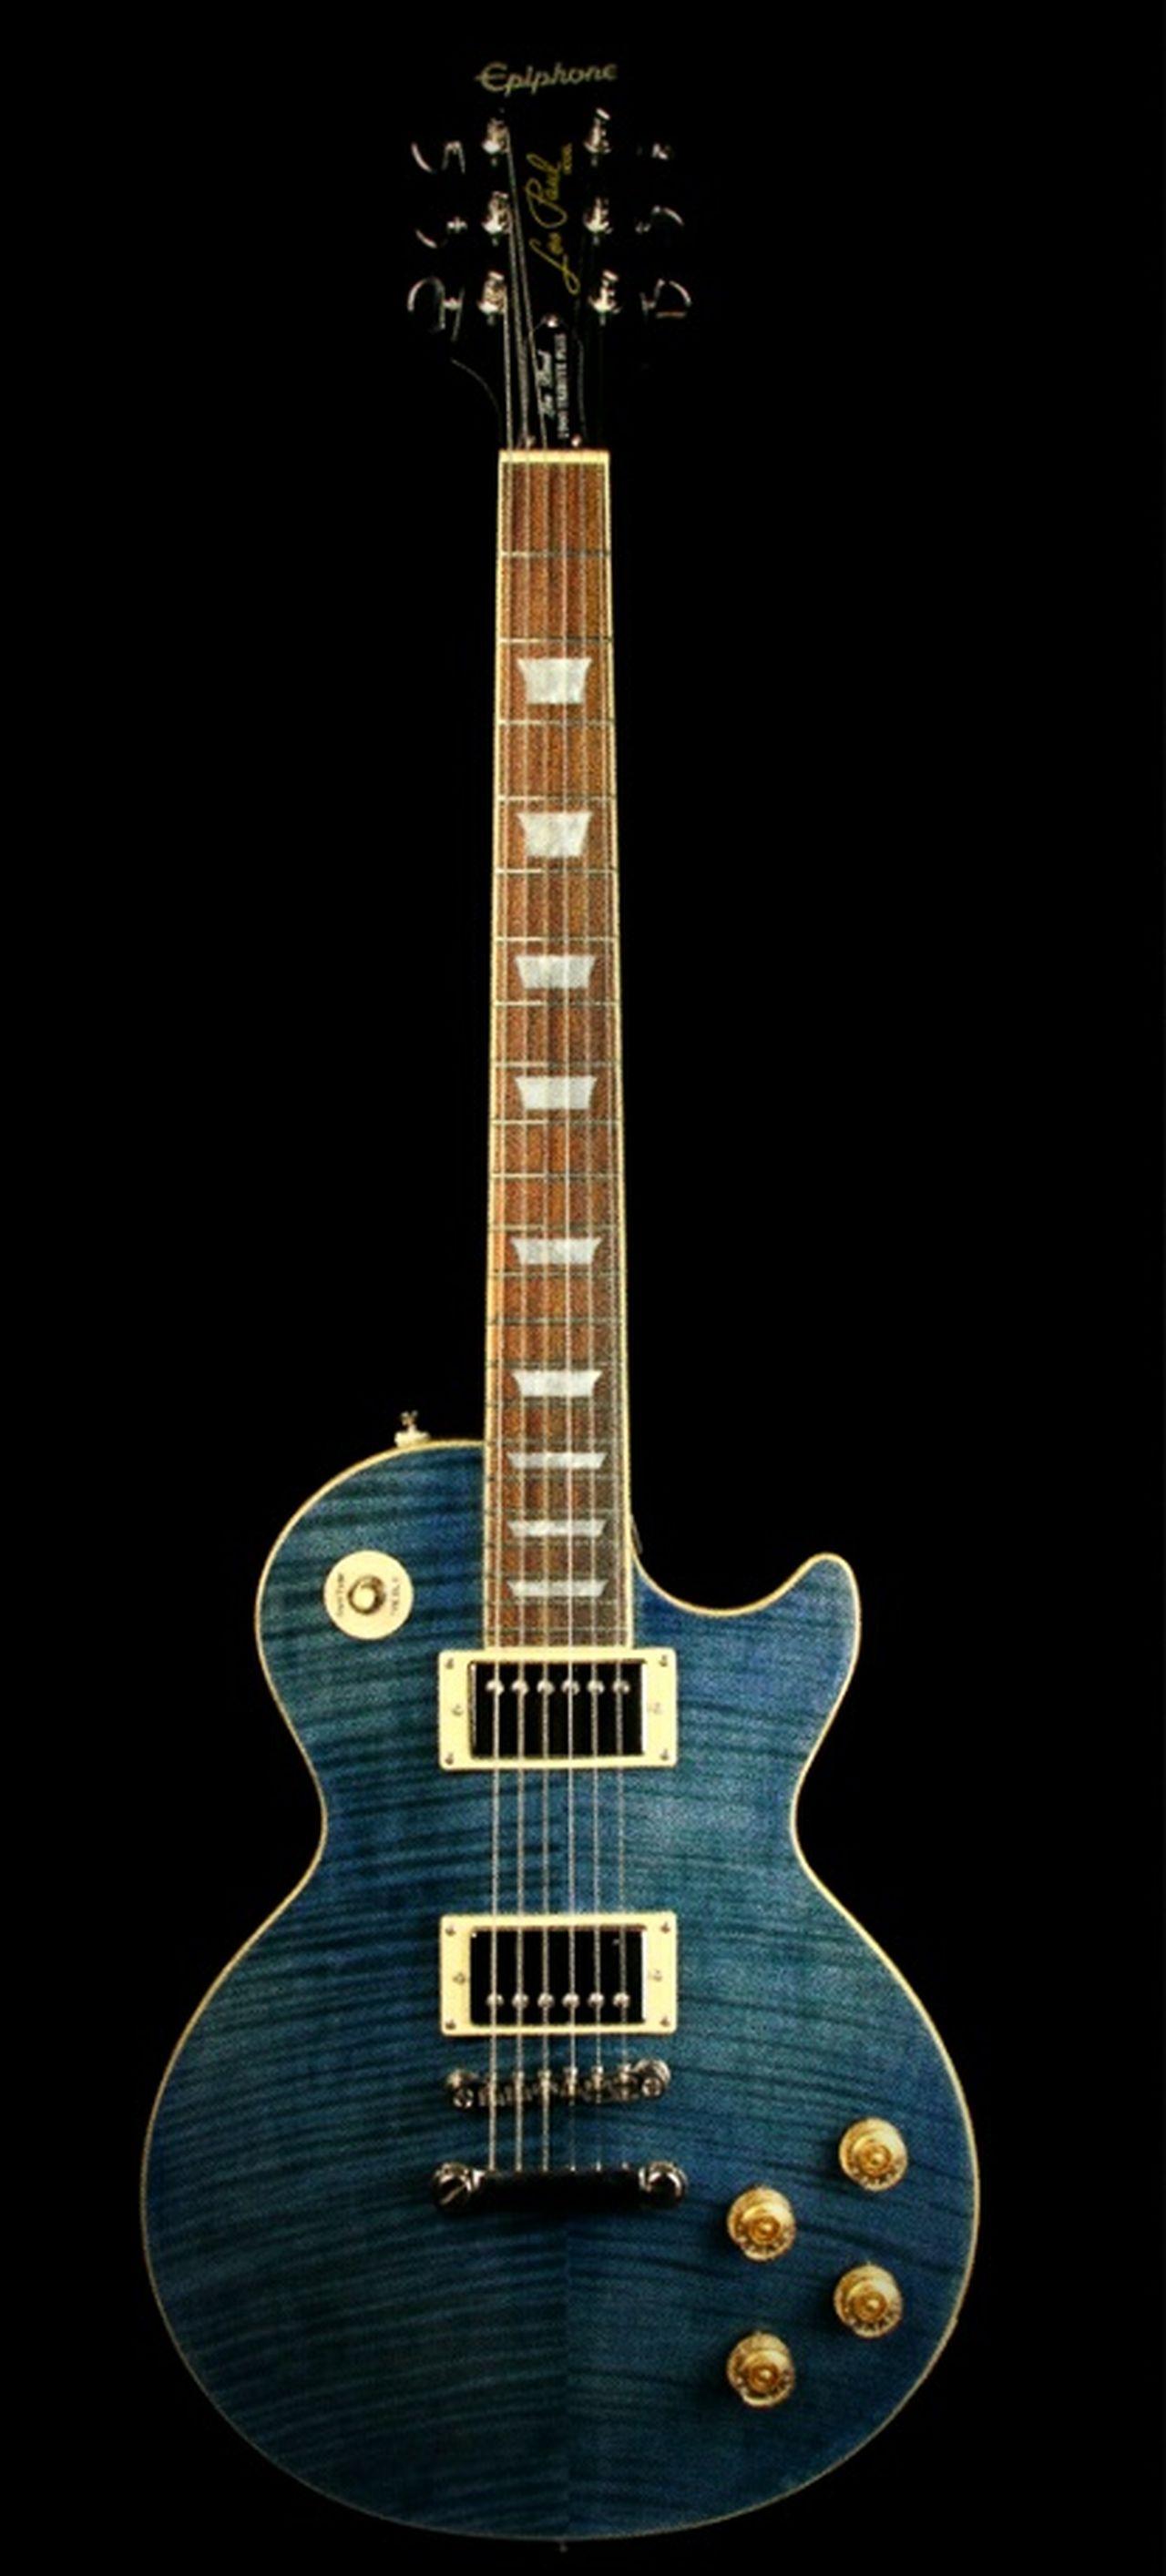 Epiphone Les Paul Special Epiphone Guitars